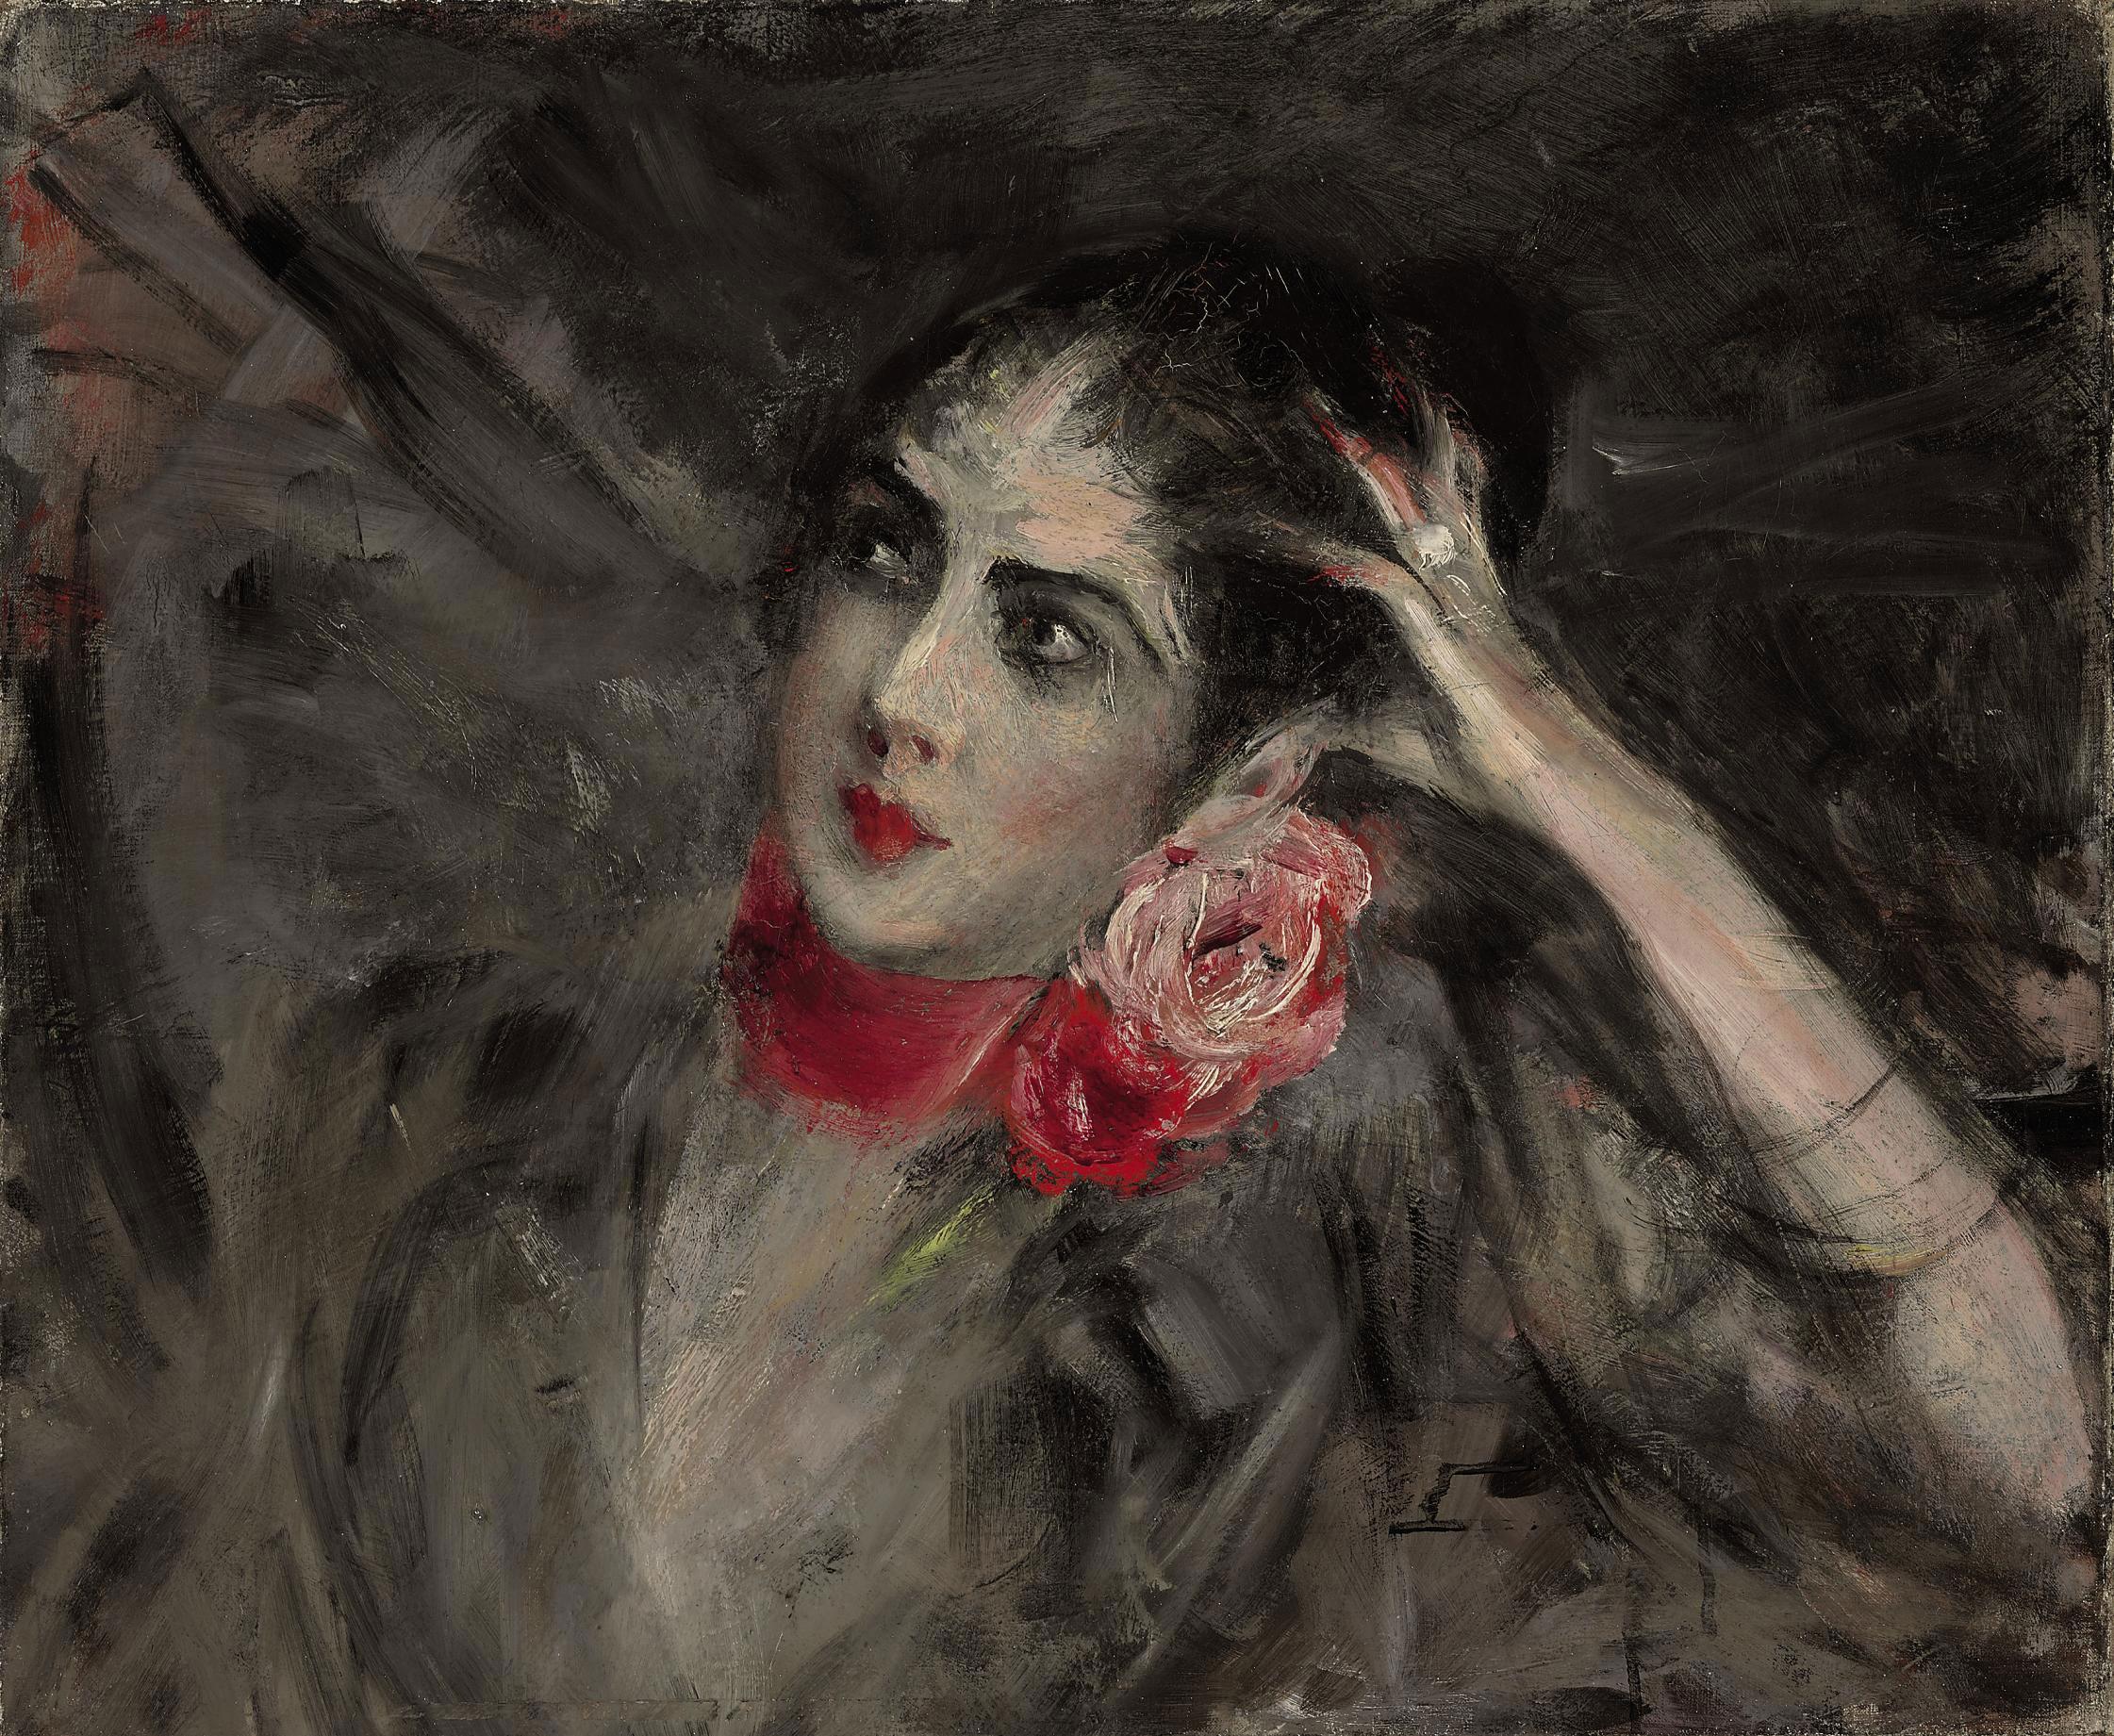 Princess Radziwill with a red ribbon around her neck